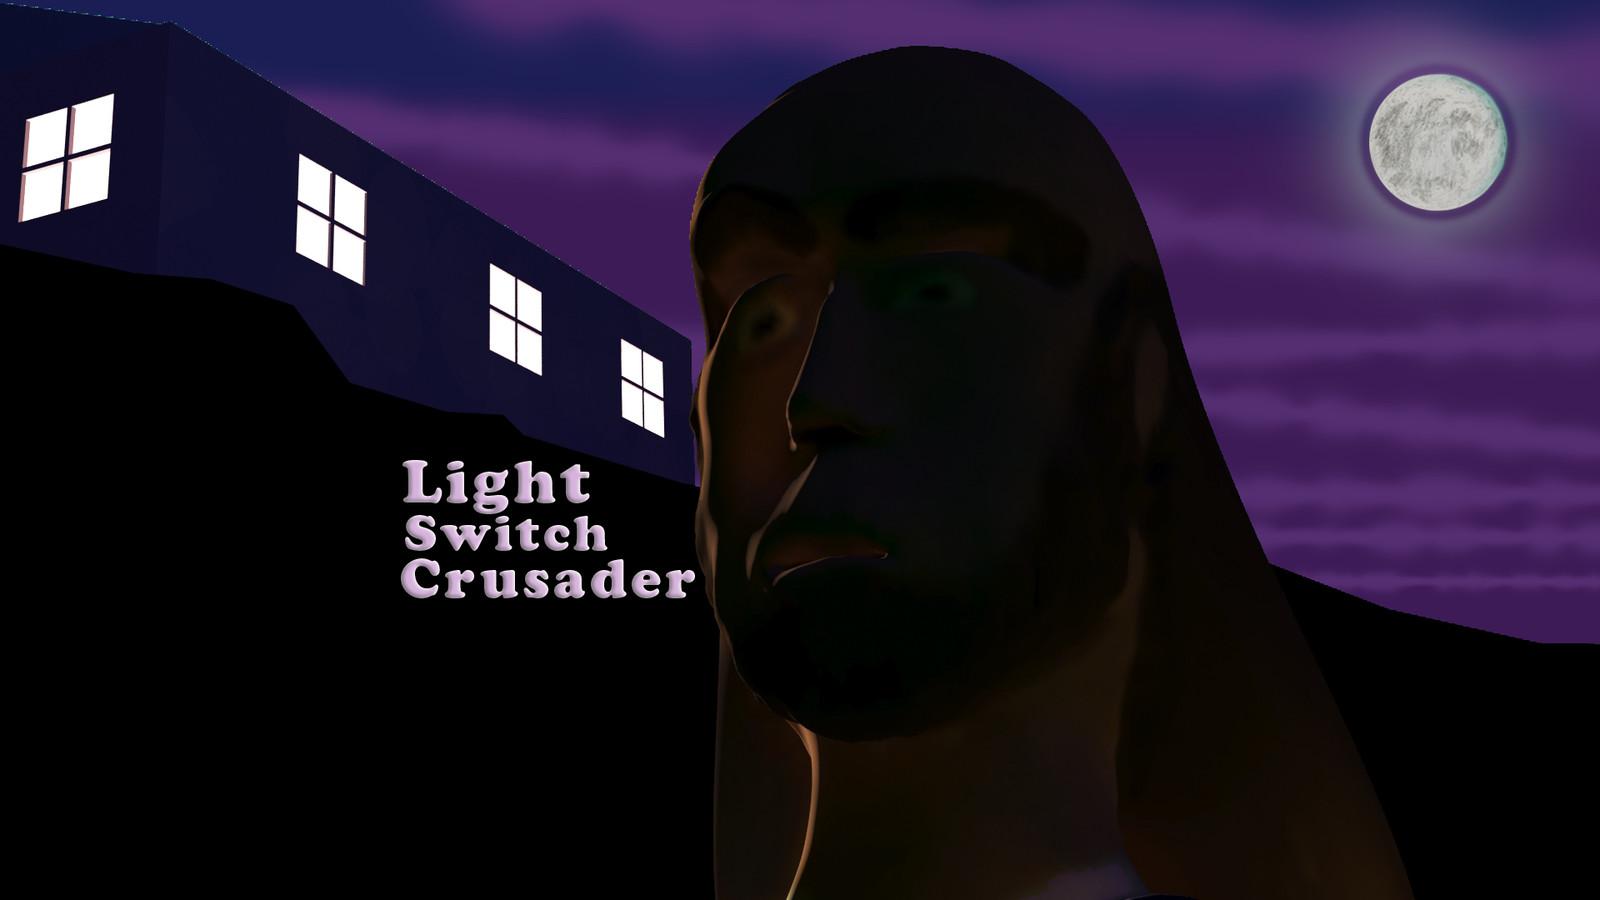 Light Switch Crusader